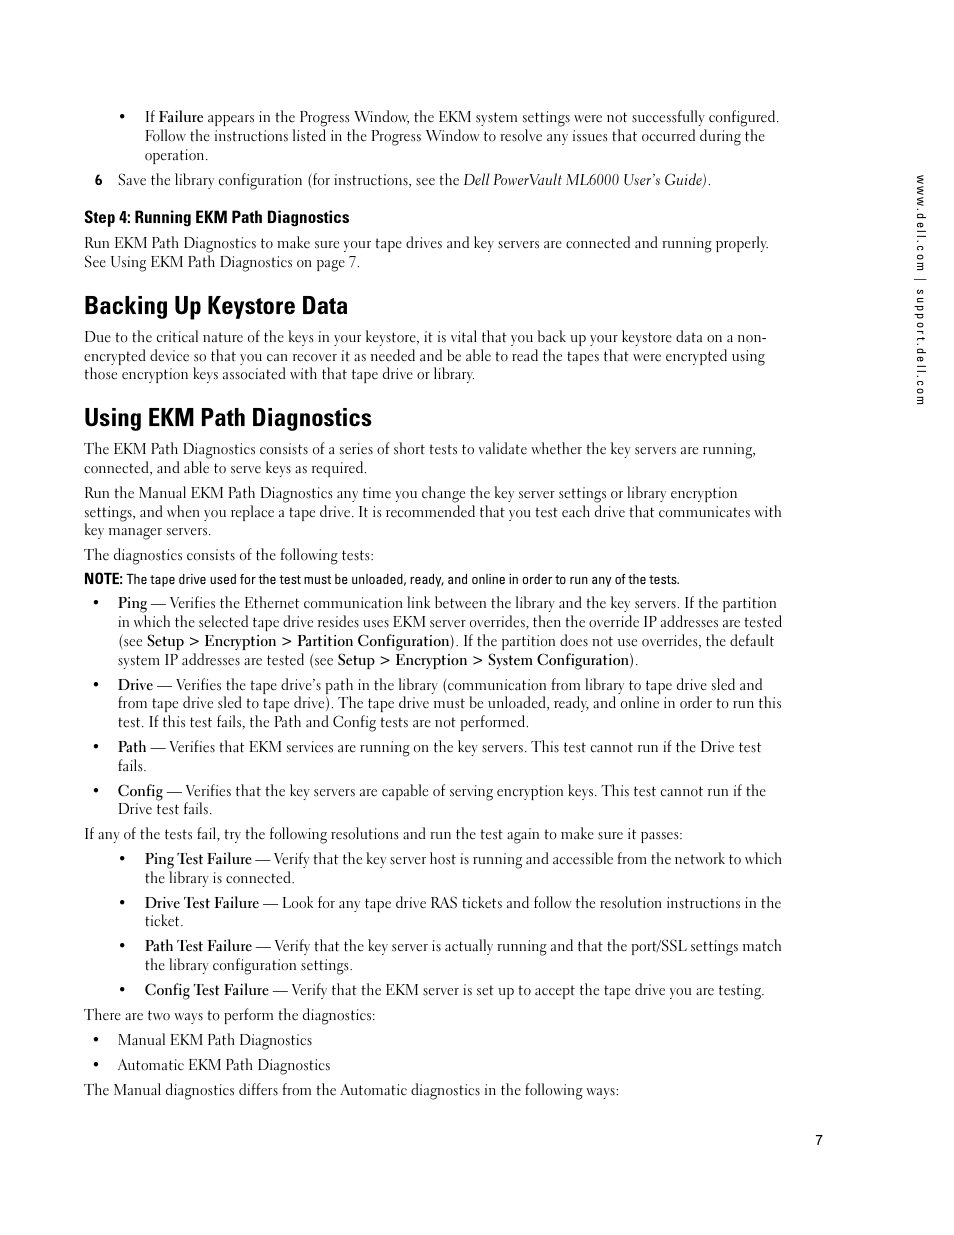 Step 4: running ekm path diagnostics, Backing up keystore data